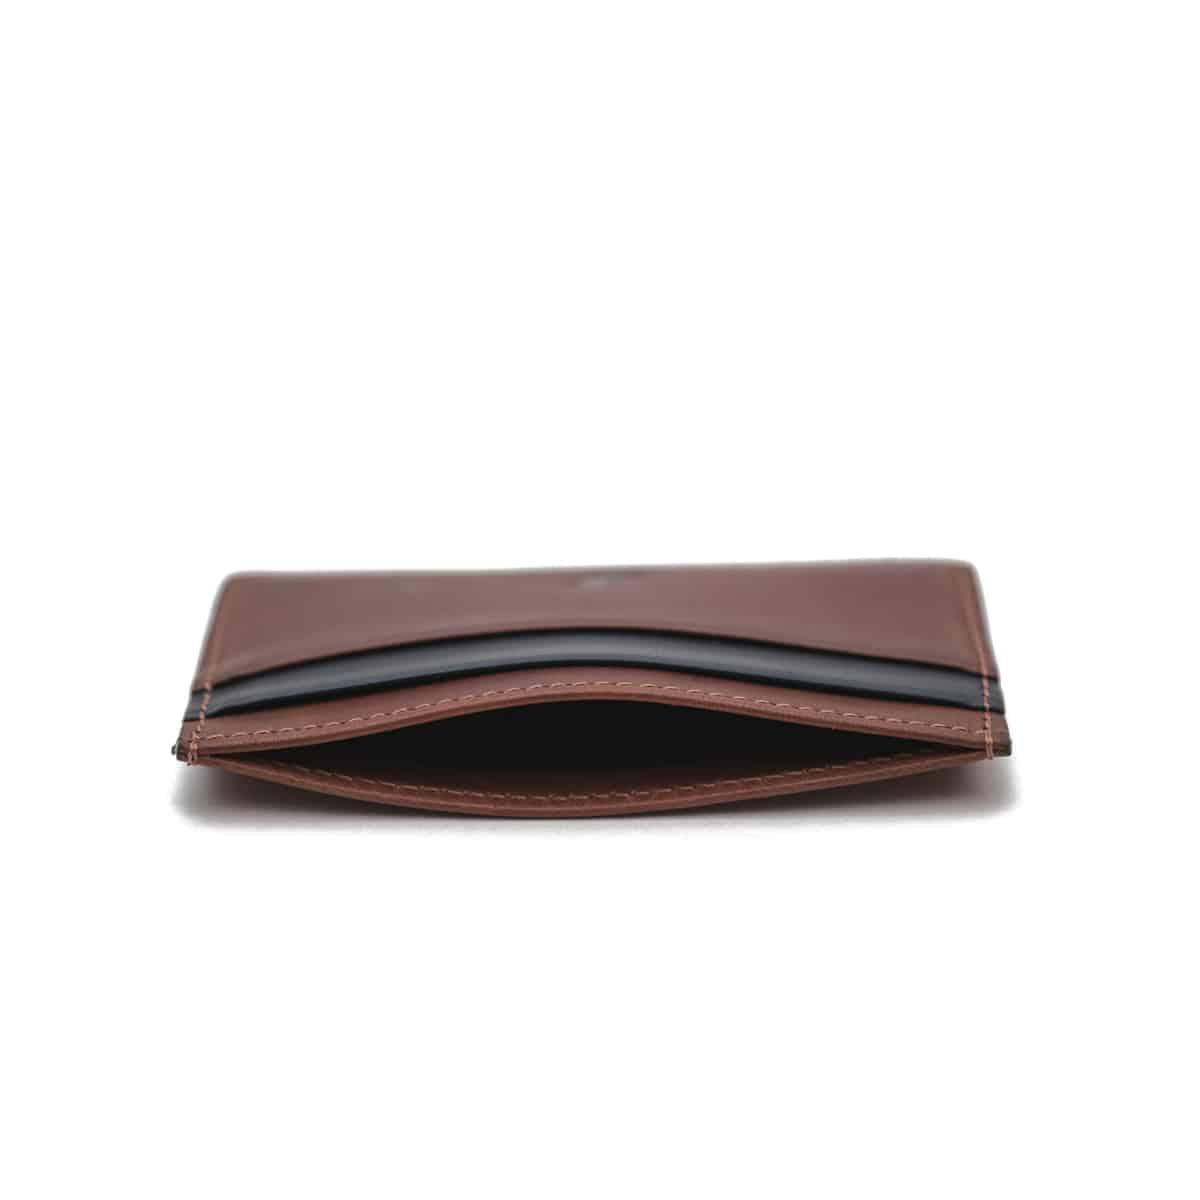 porte-cartes pied de biche cuir